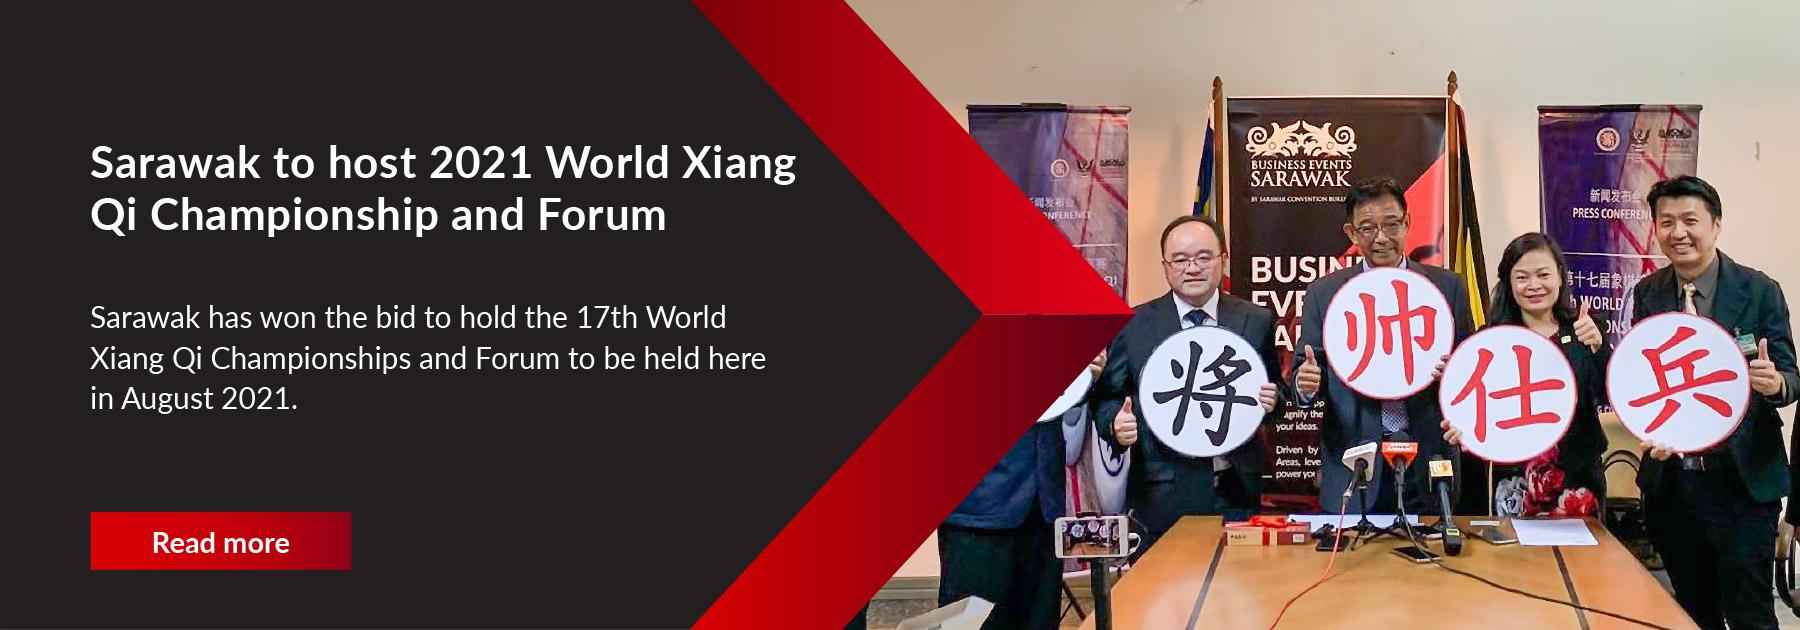 Sarawak to host 2021 World Xiang Qi Championship and Forum